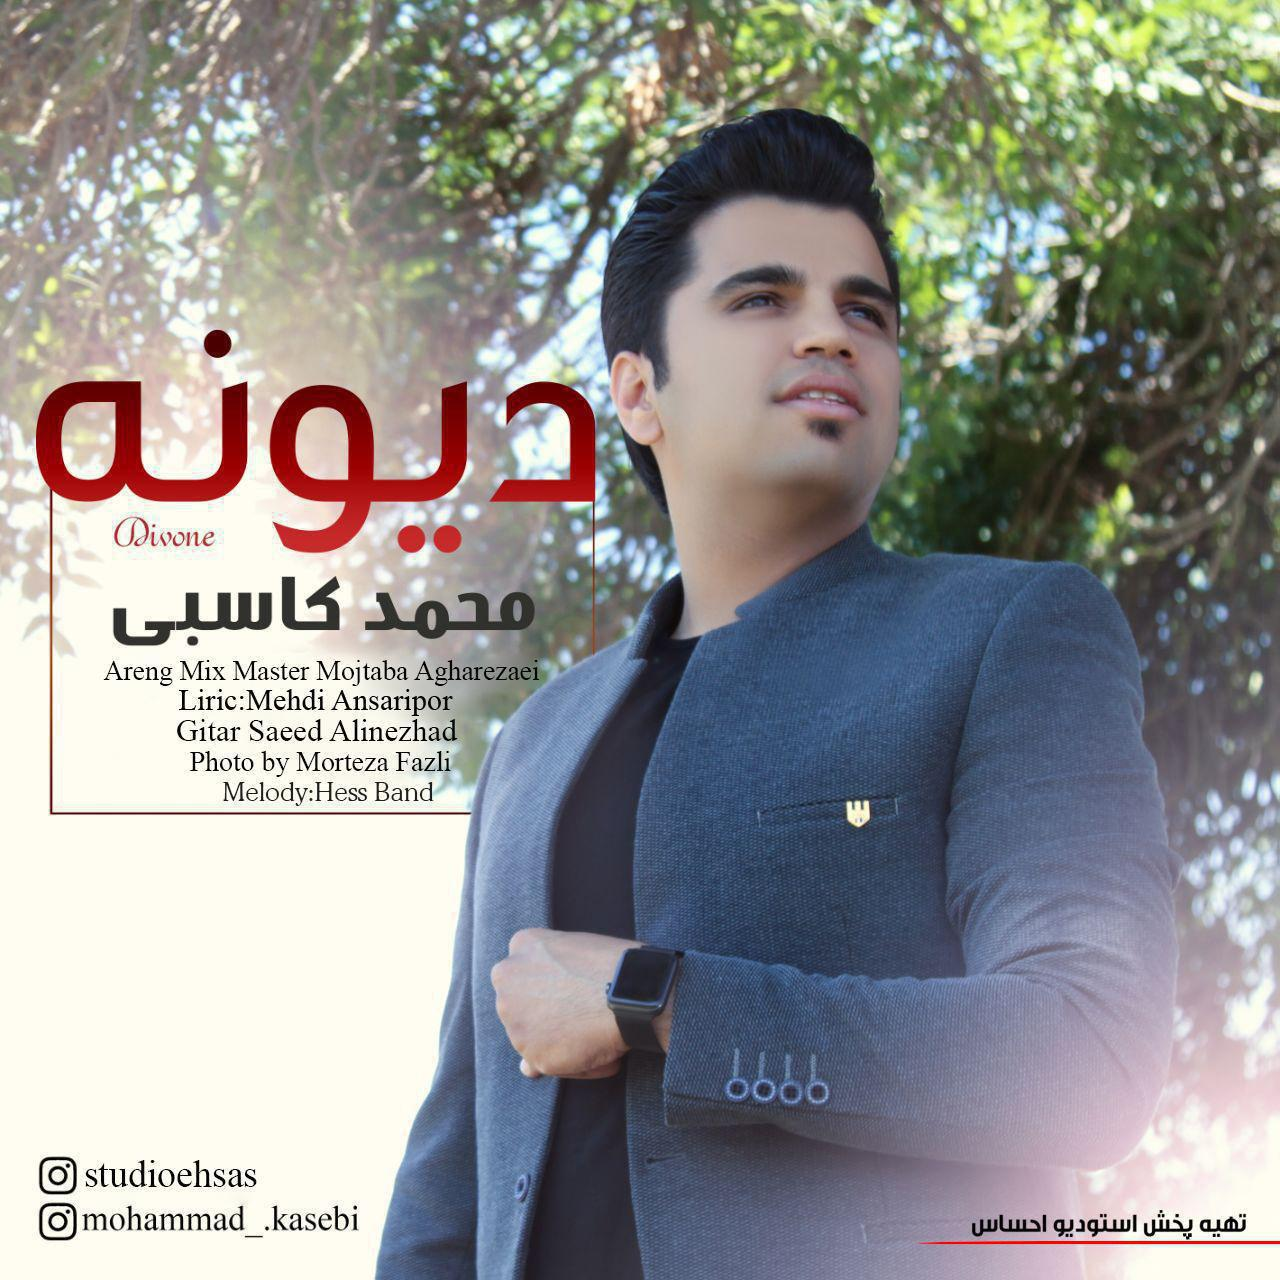 http://dl.rasanejavan.com/radio97/04/11/mohamad%20kasebi.jpg